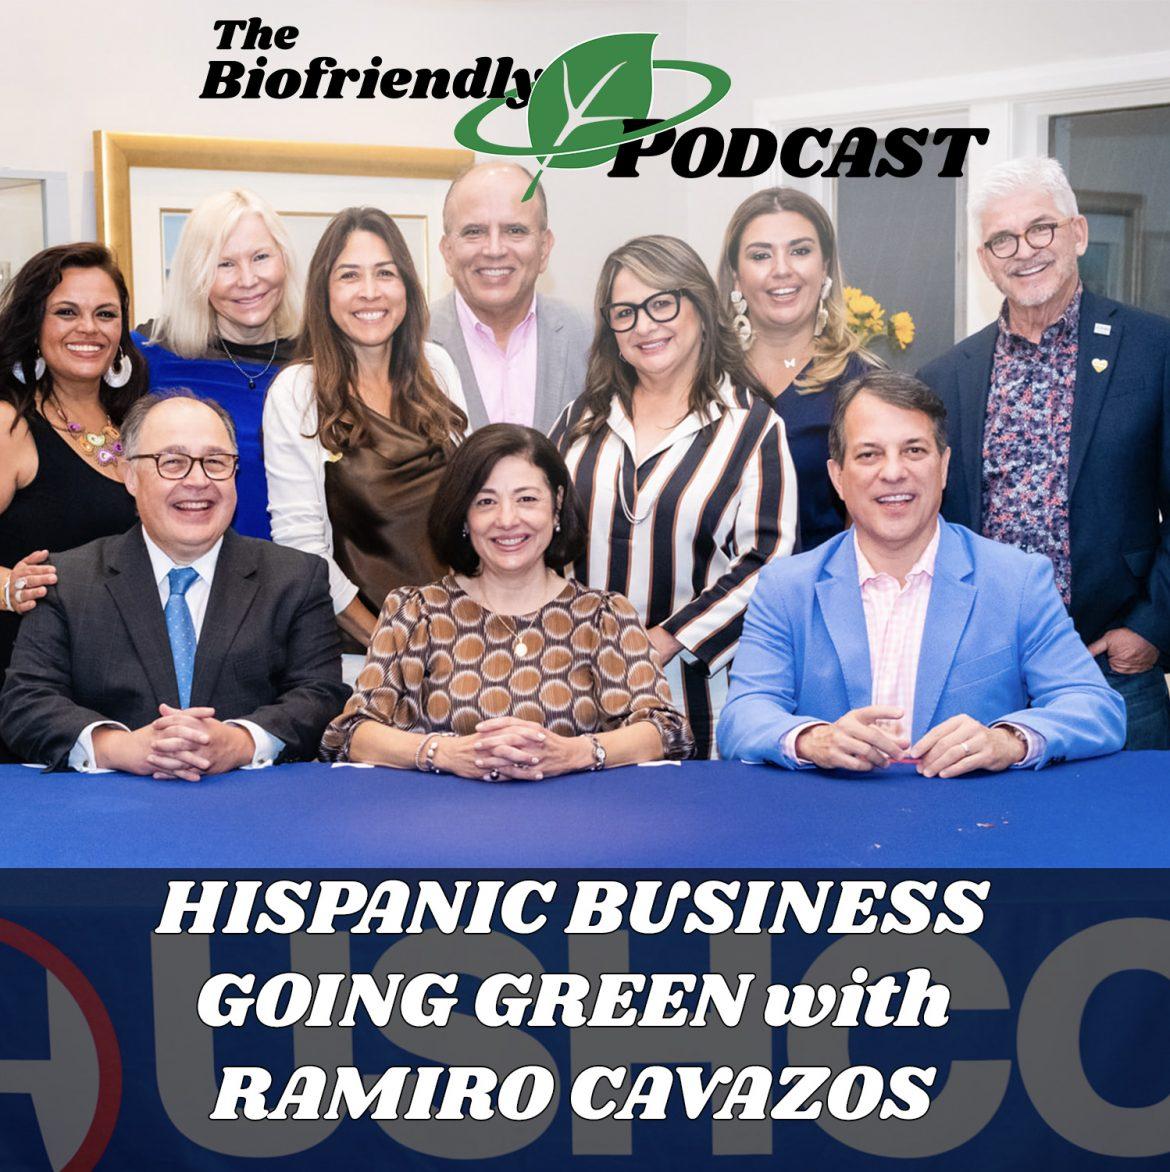 Hispanic Business Going Green with Ramiro Cavazos